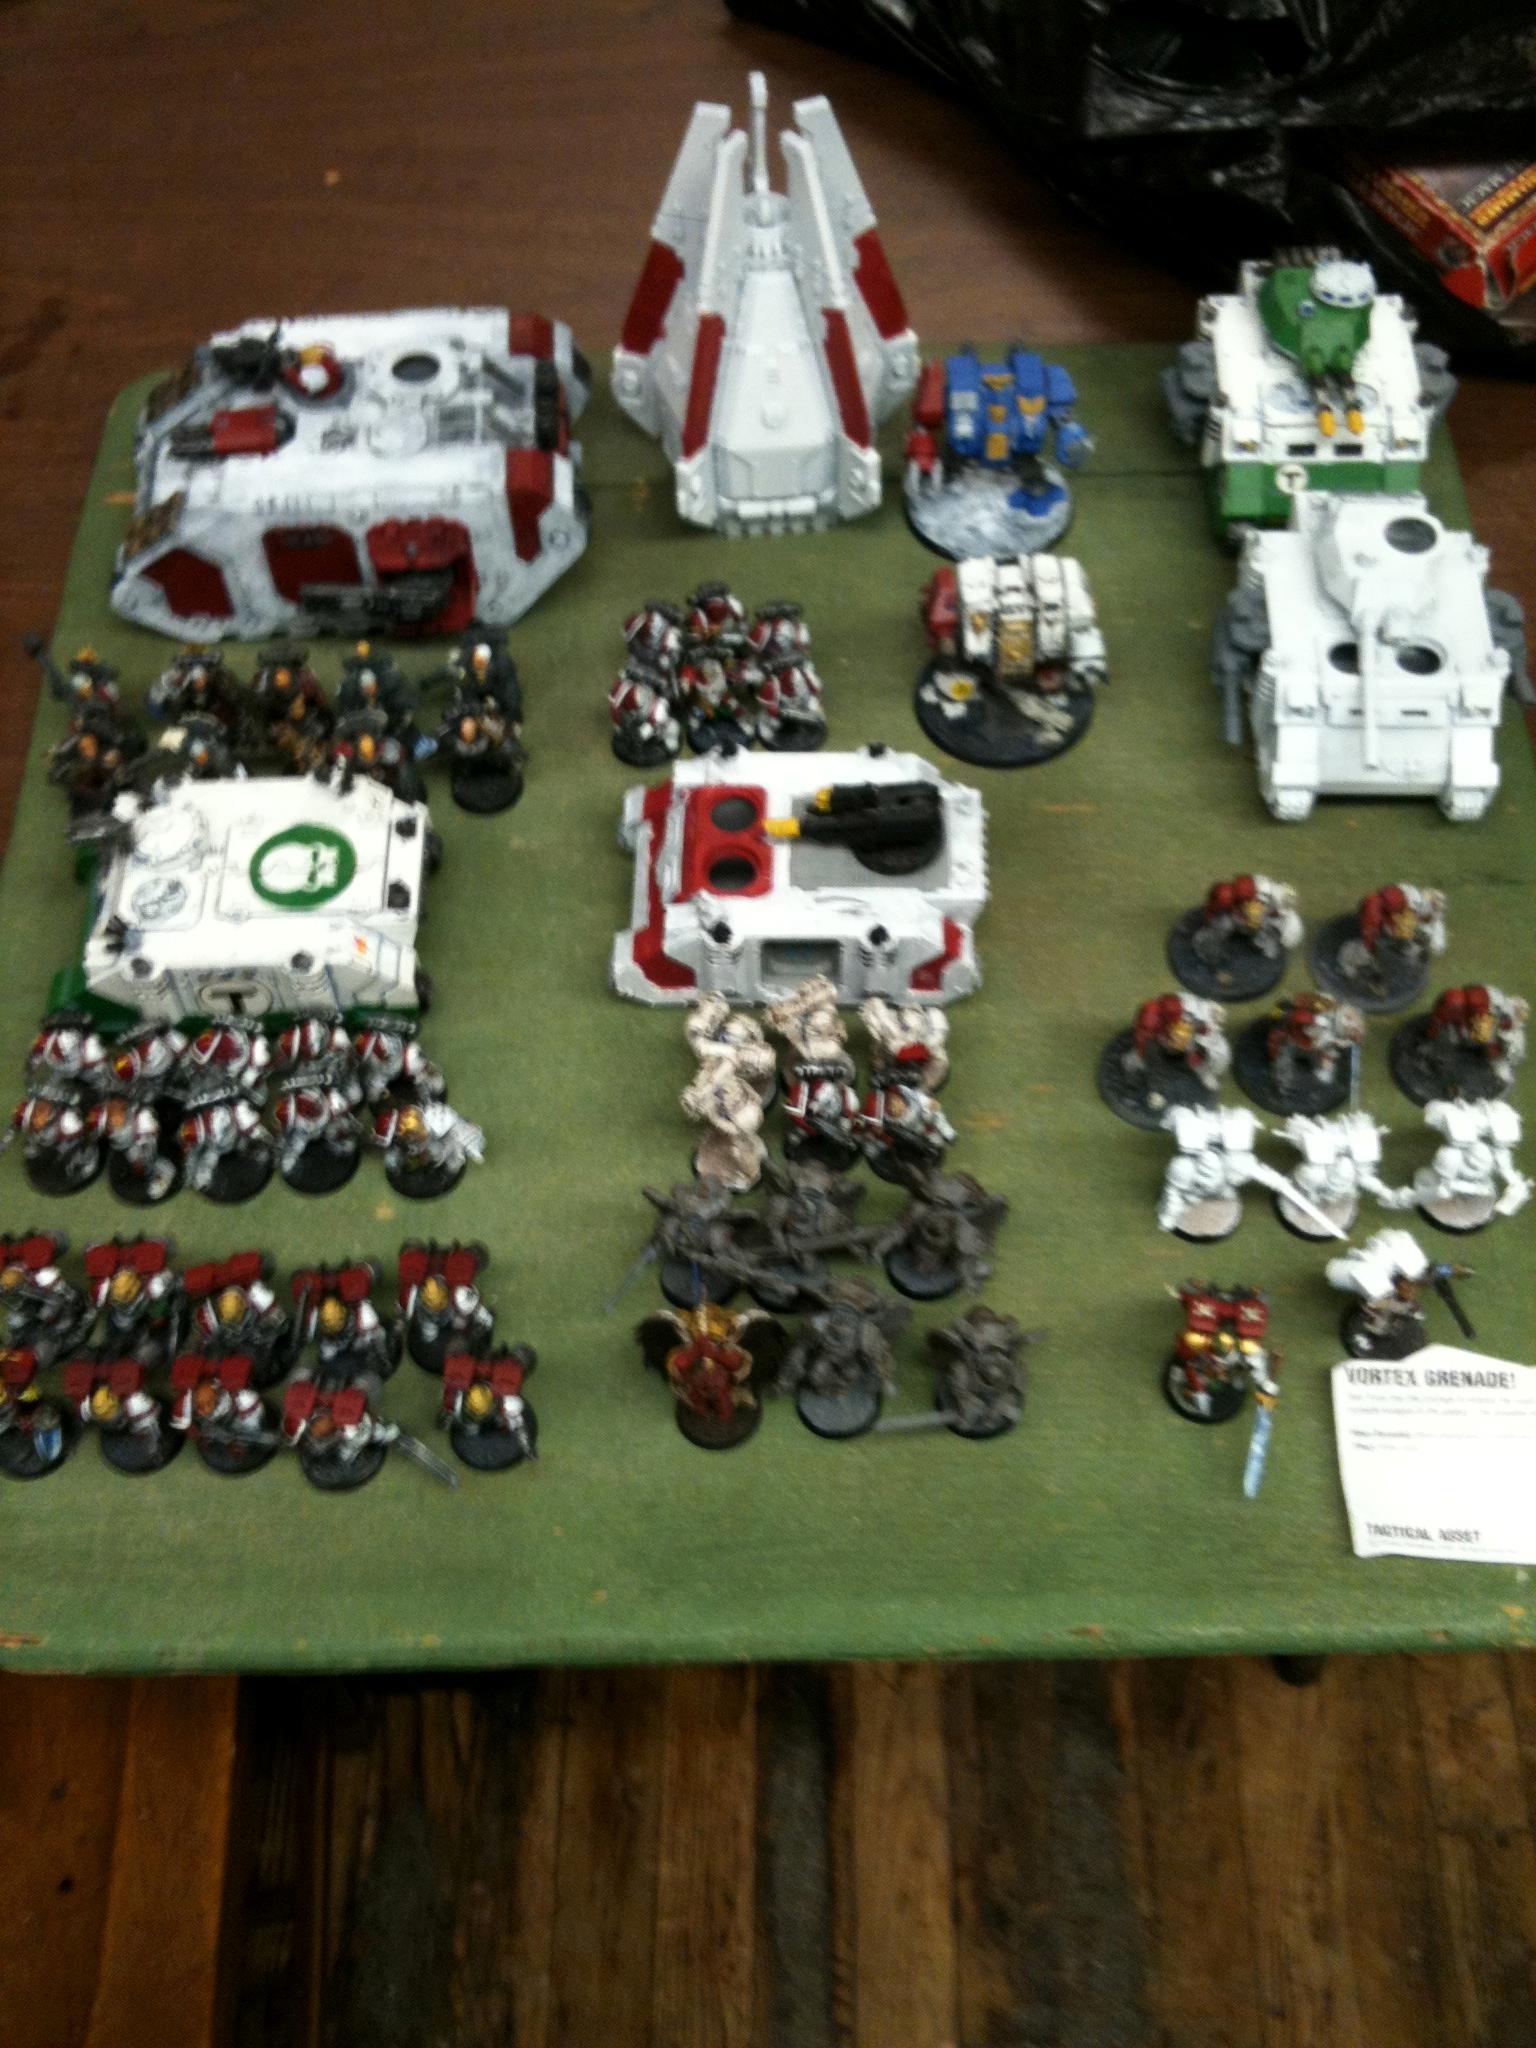 Apocalypse, Army, Blood Angels, Mega-battle, Space Marines, Warhammer 40,000